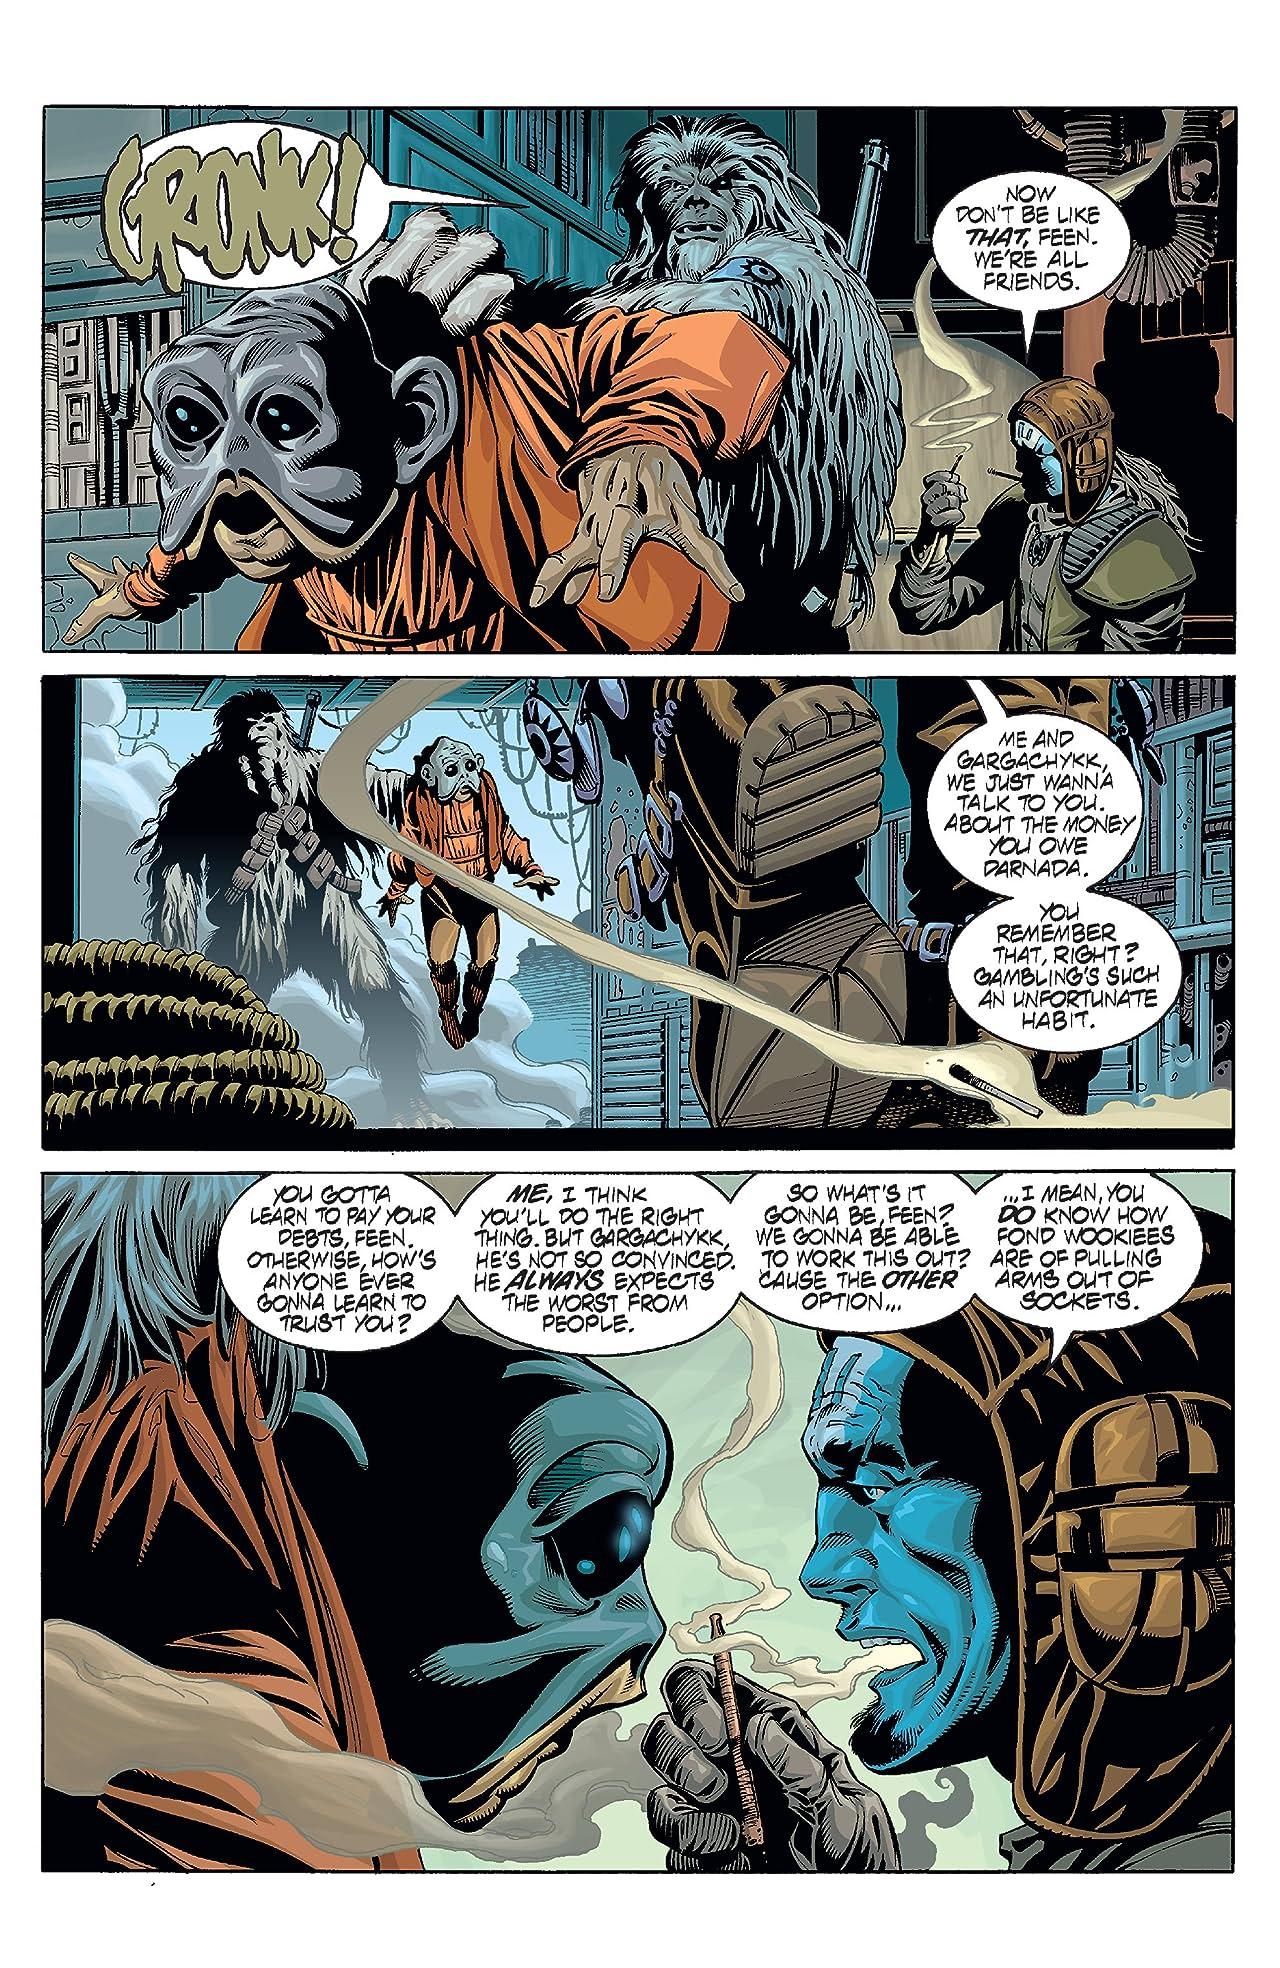 Star Wars: Darth Maul (2000) #2 (of 4)